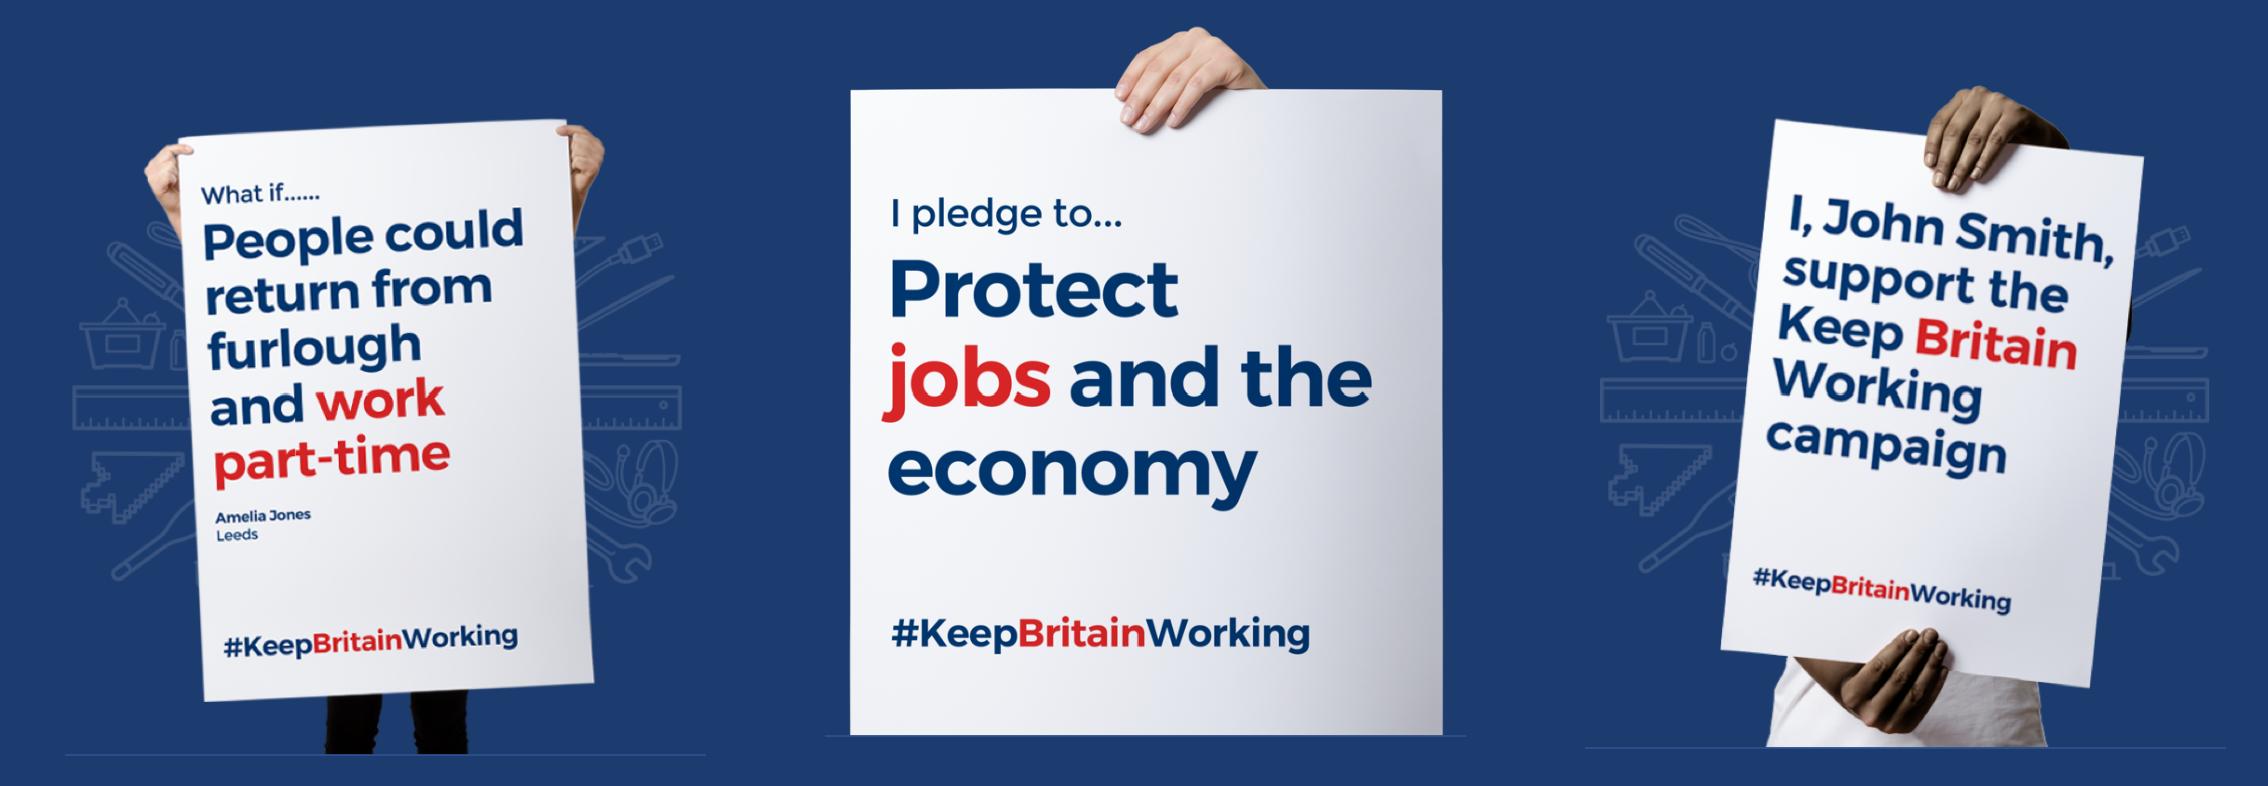 keep britain working - support pledges